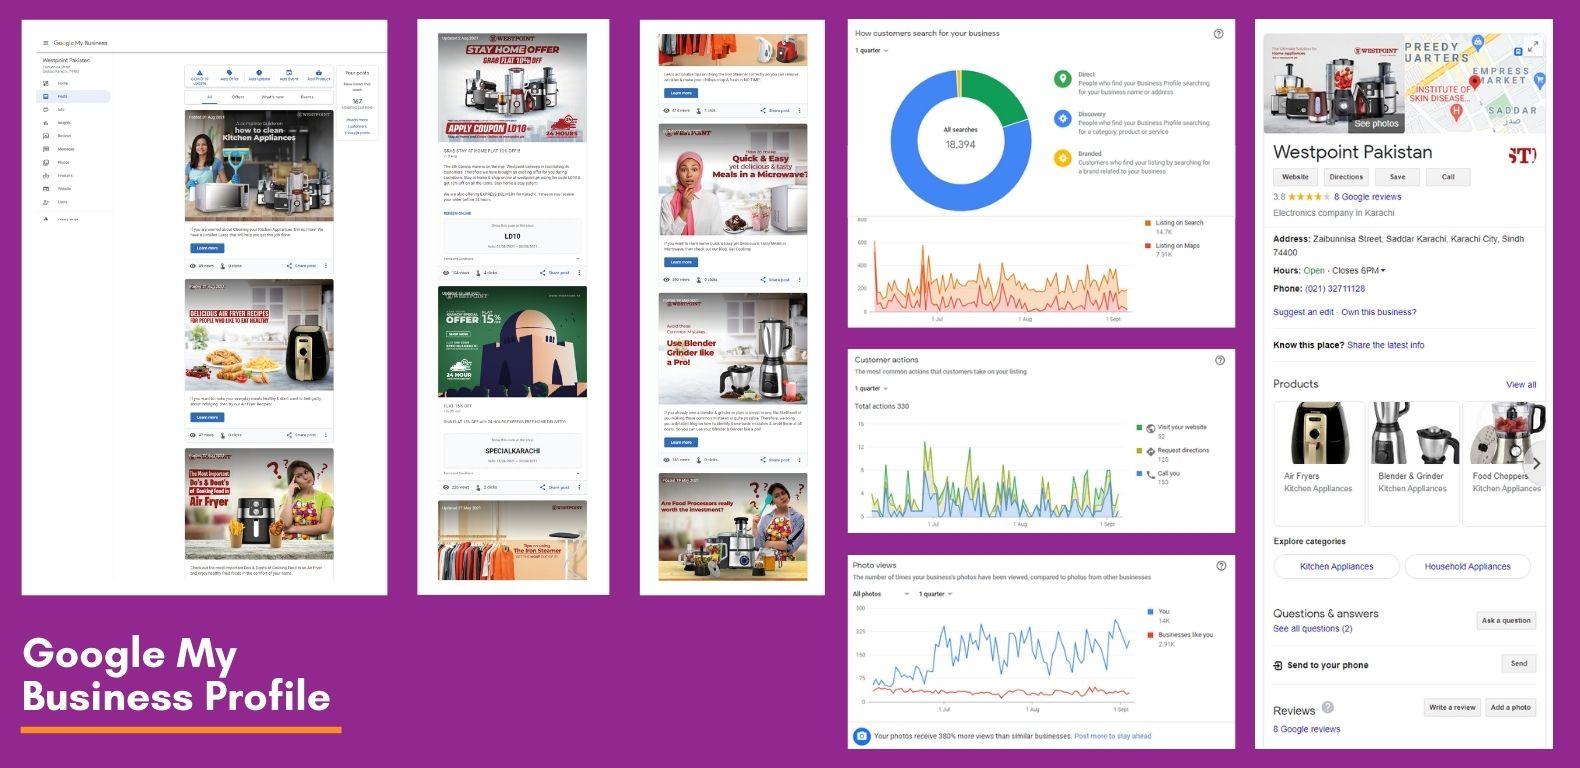 SEO-Westpoint-Pakistan-google-my-business-profile-optimization-analytics